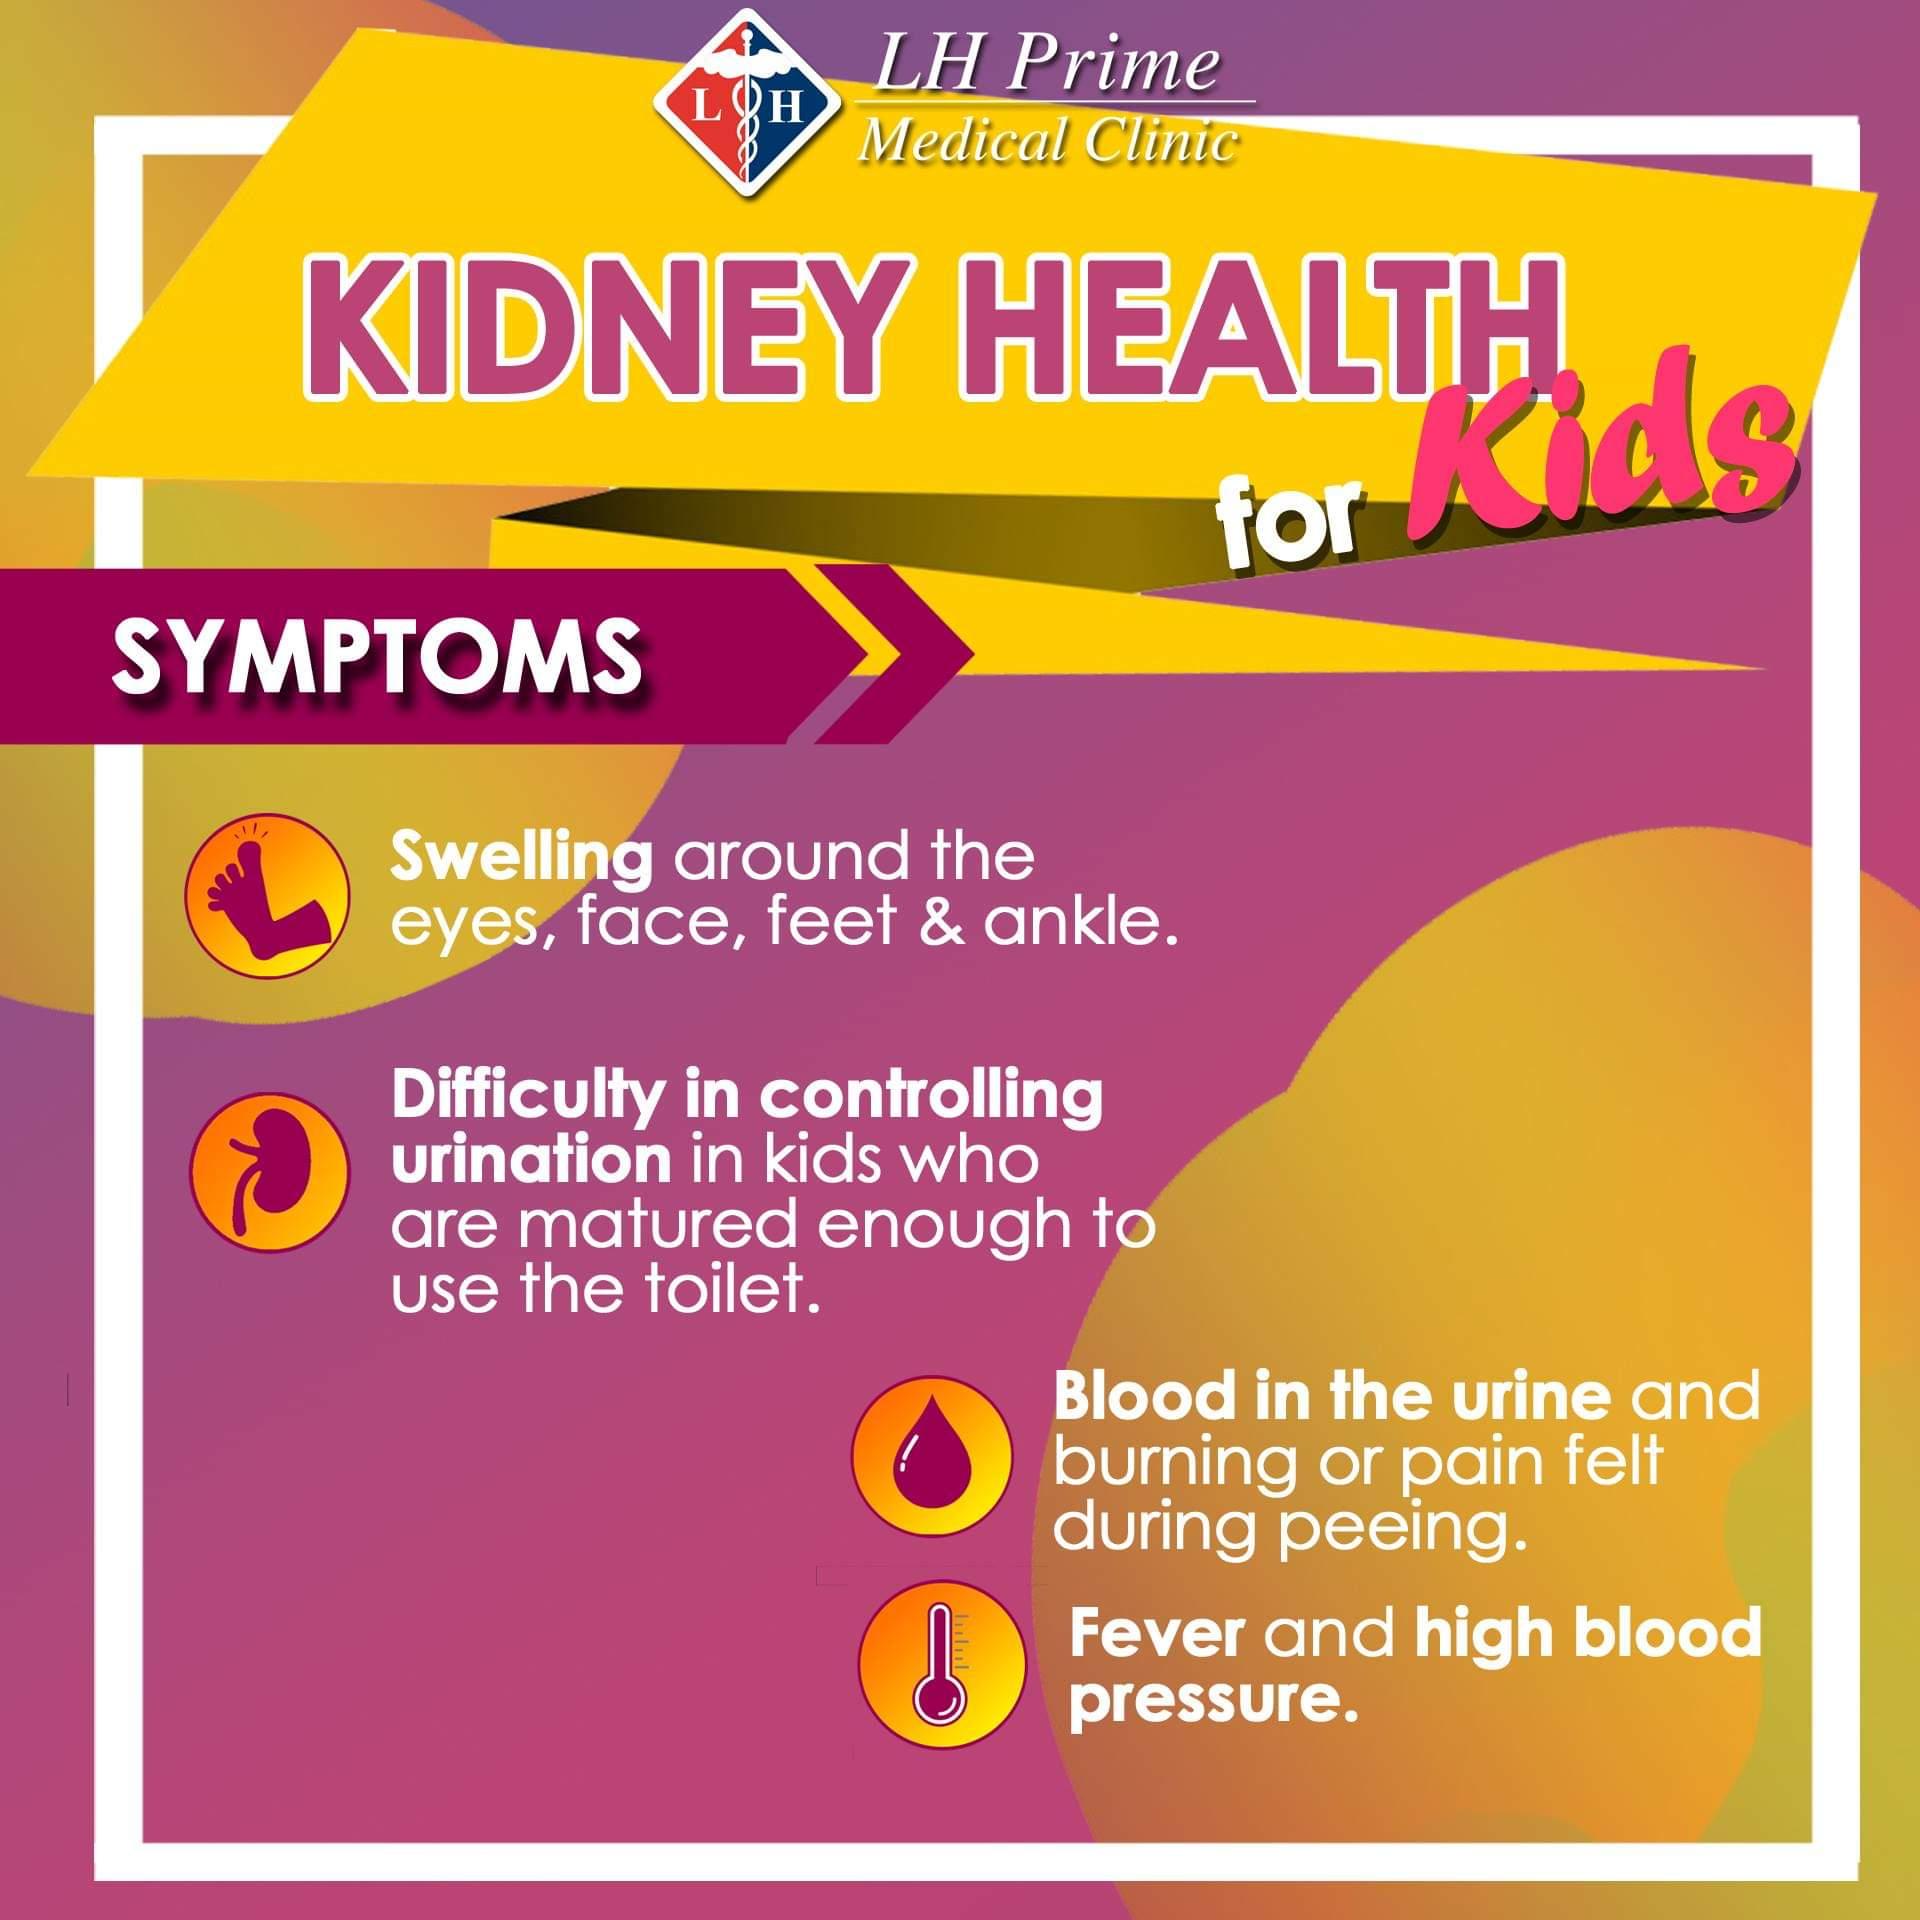 Kidney Health for Kids Symptoms